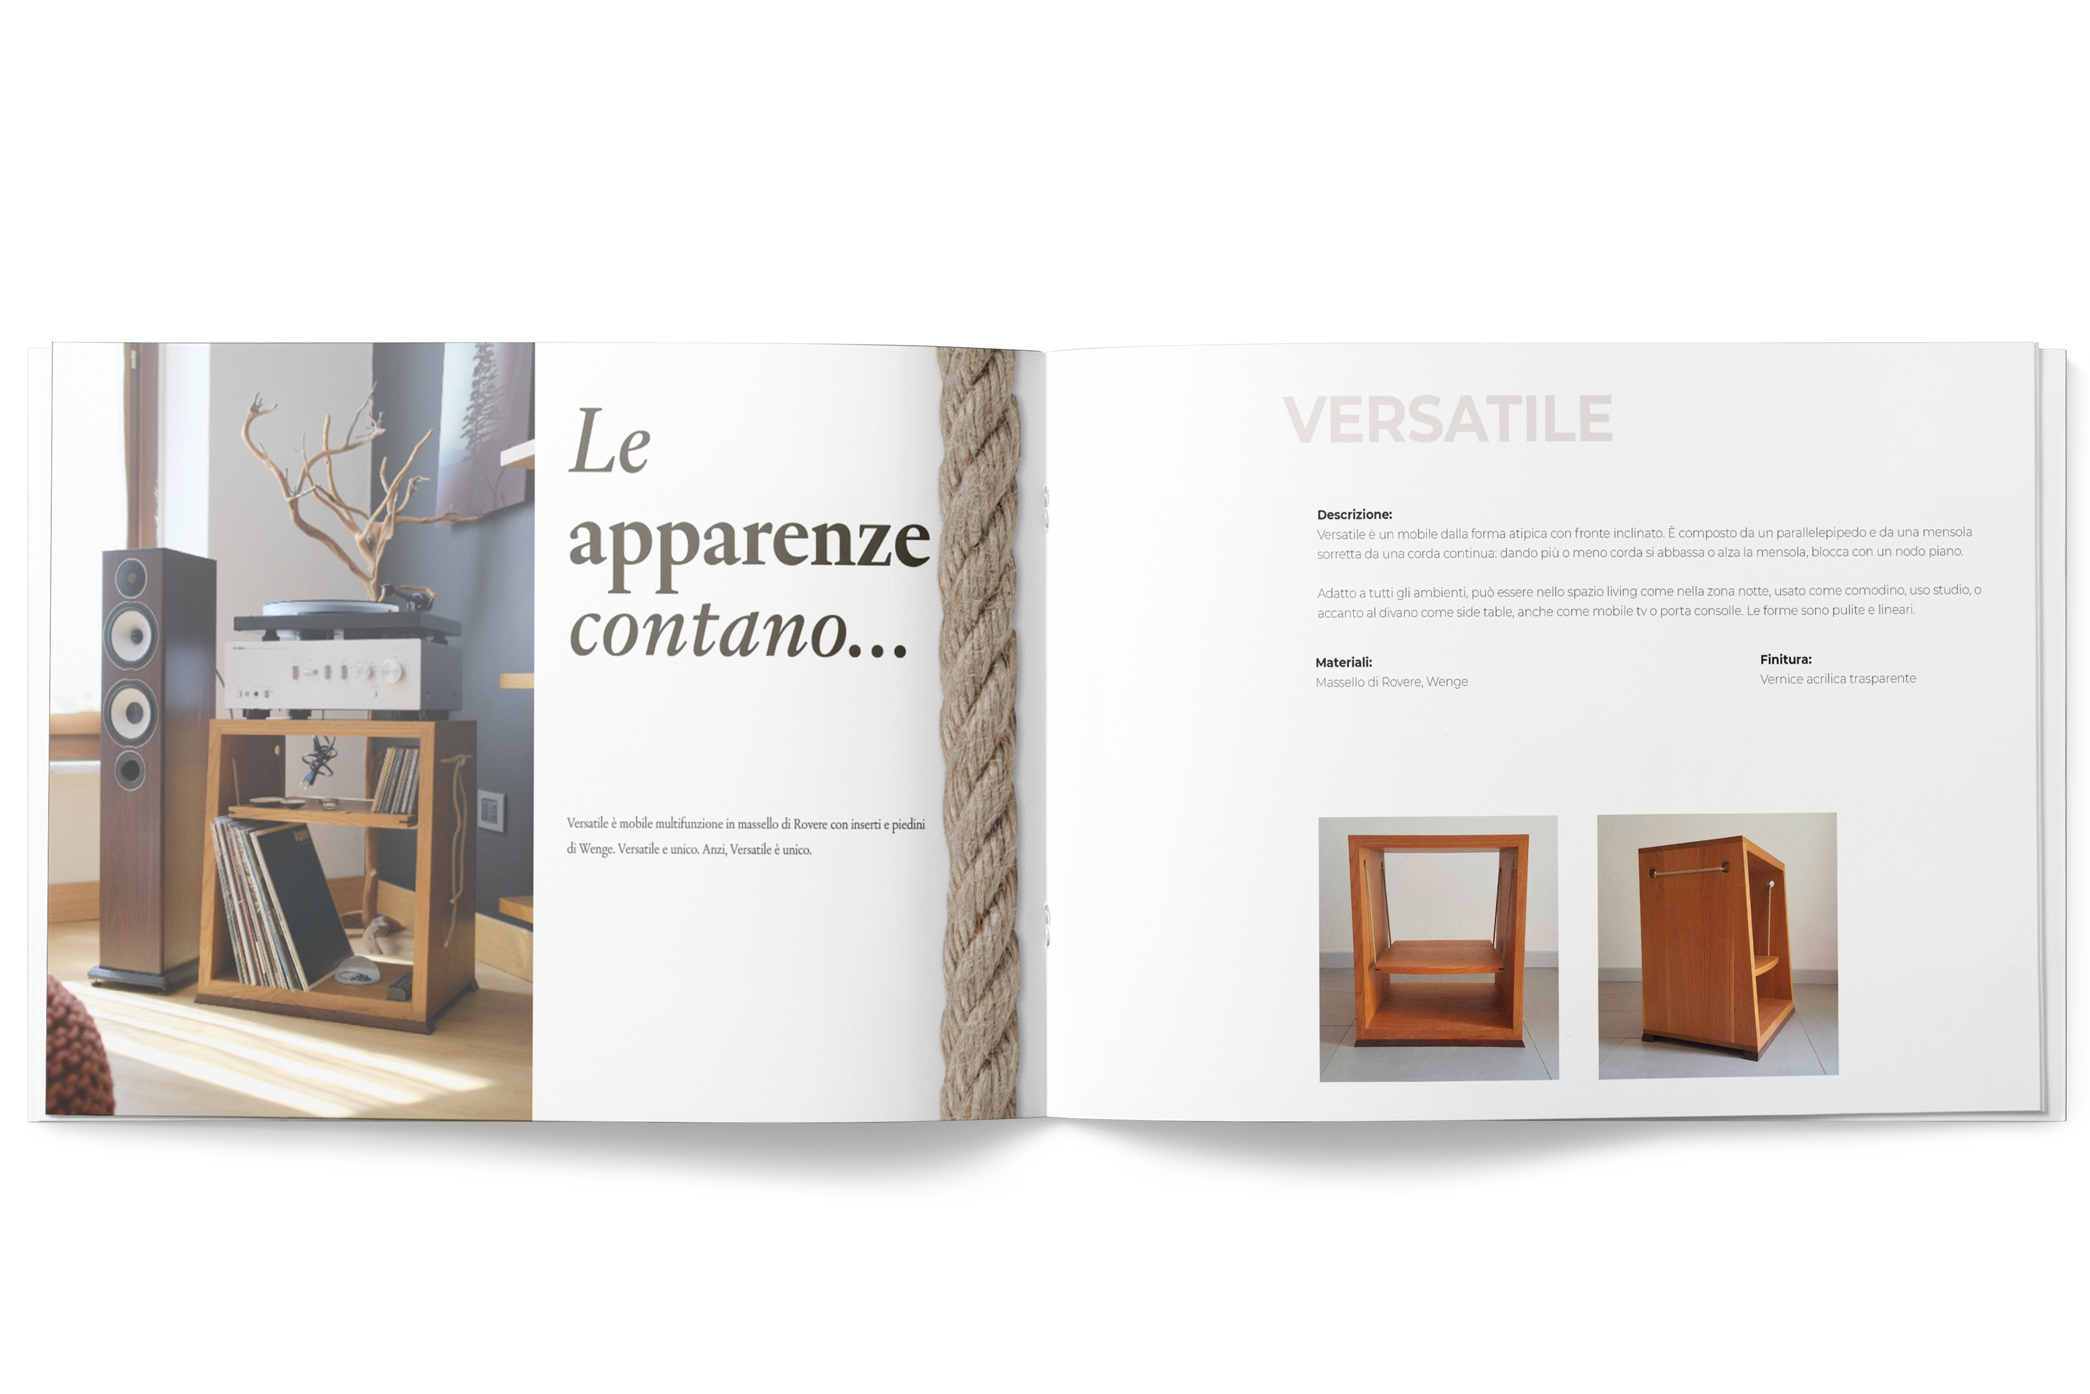 brochure_ebanisteria8